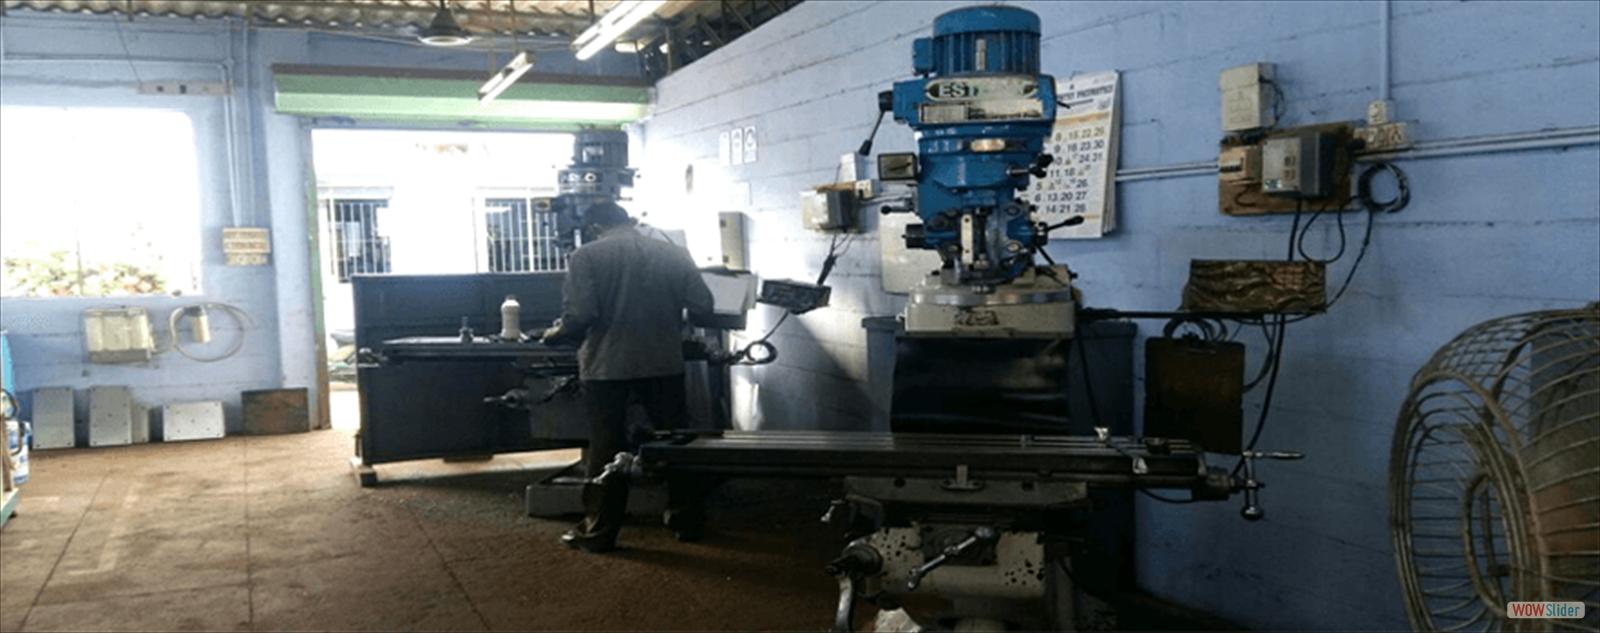 Machine Room 1